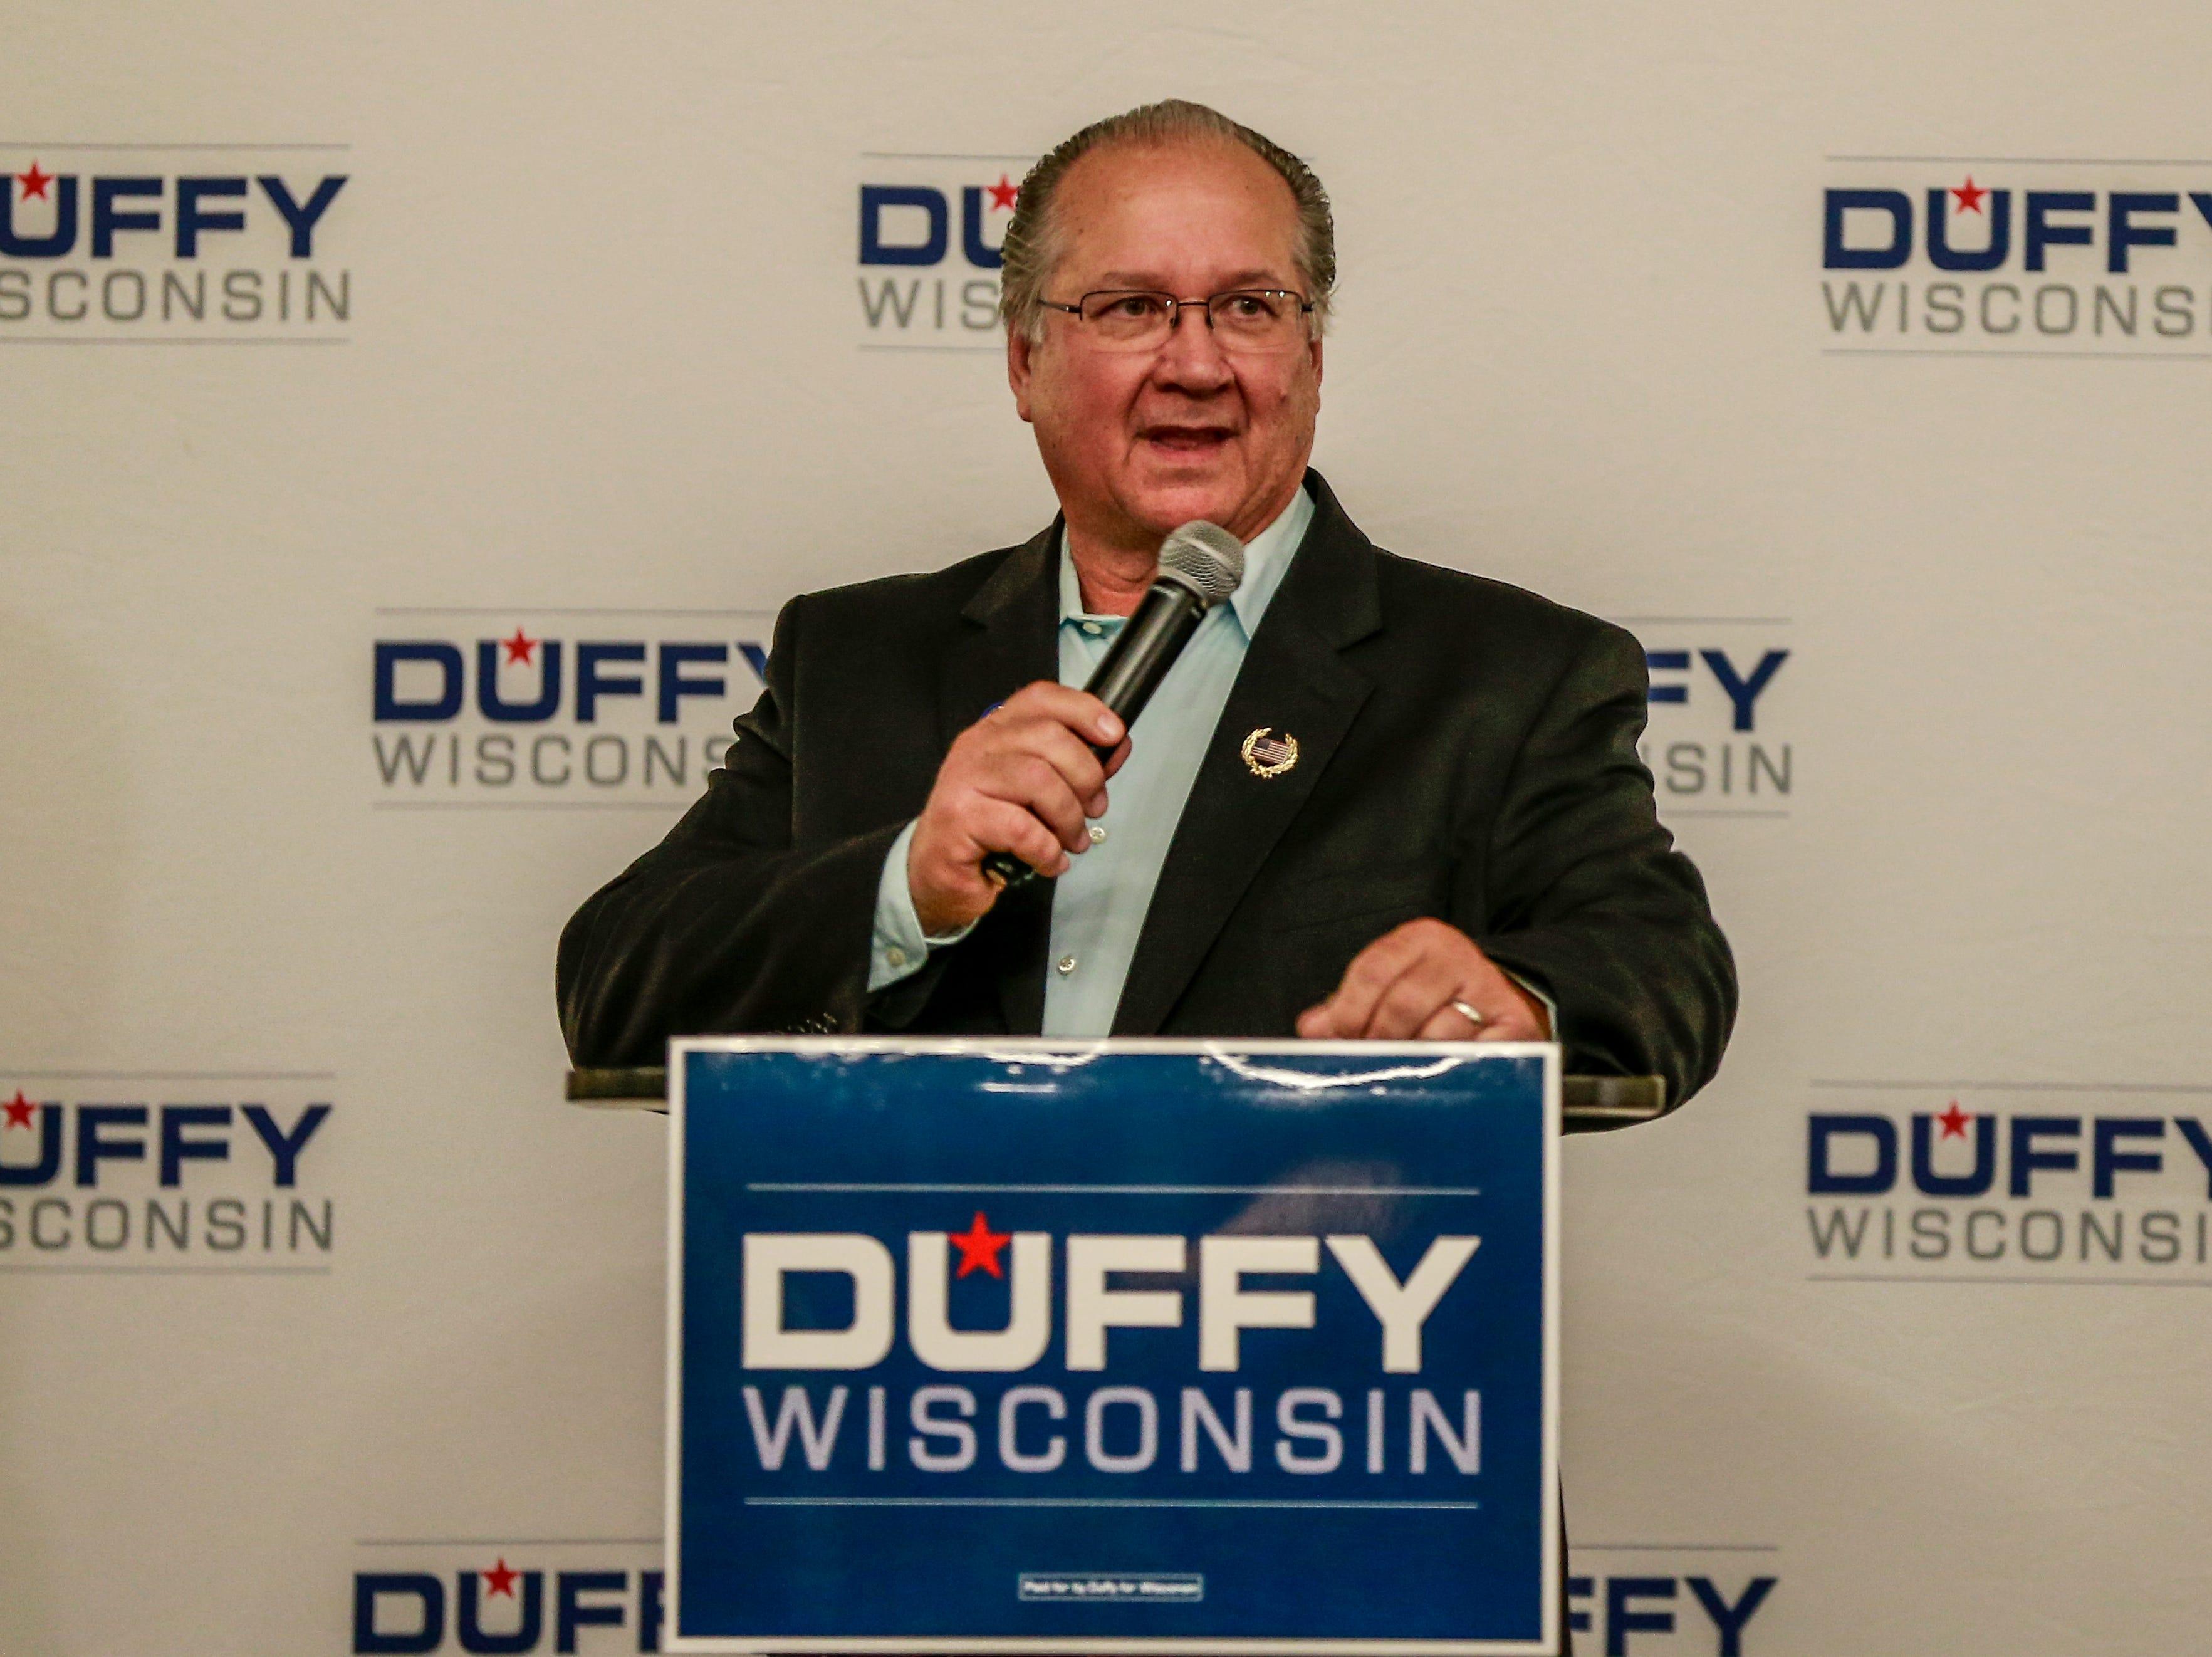 Republican Sen. Jerry Petrowski makes a speech Tuesday, Nov. 7, 2018, at Hilton Garden Inn in Wausau, Wis. T'xer Zhon Kha/USA TODAY NETWORK-Wisconsin